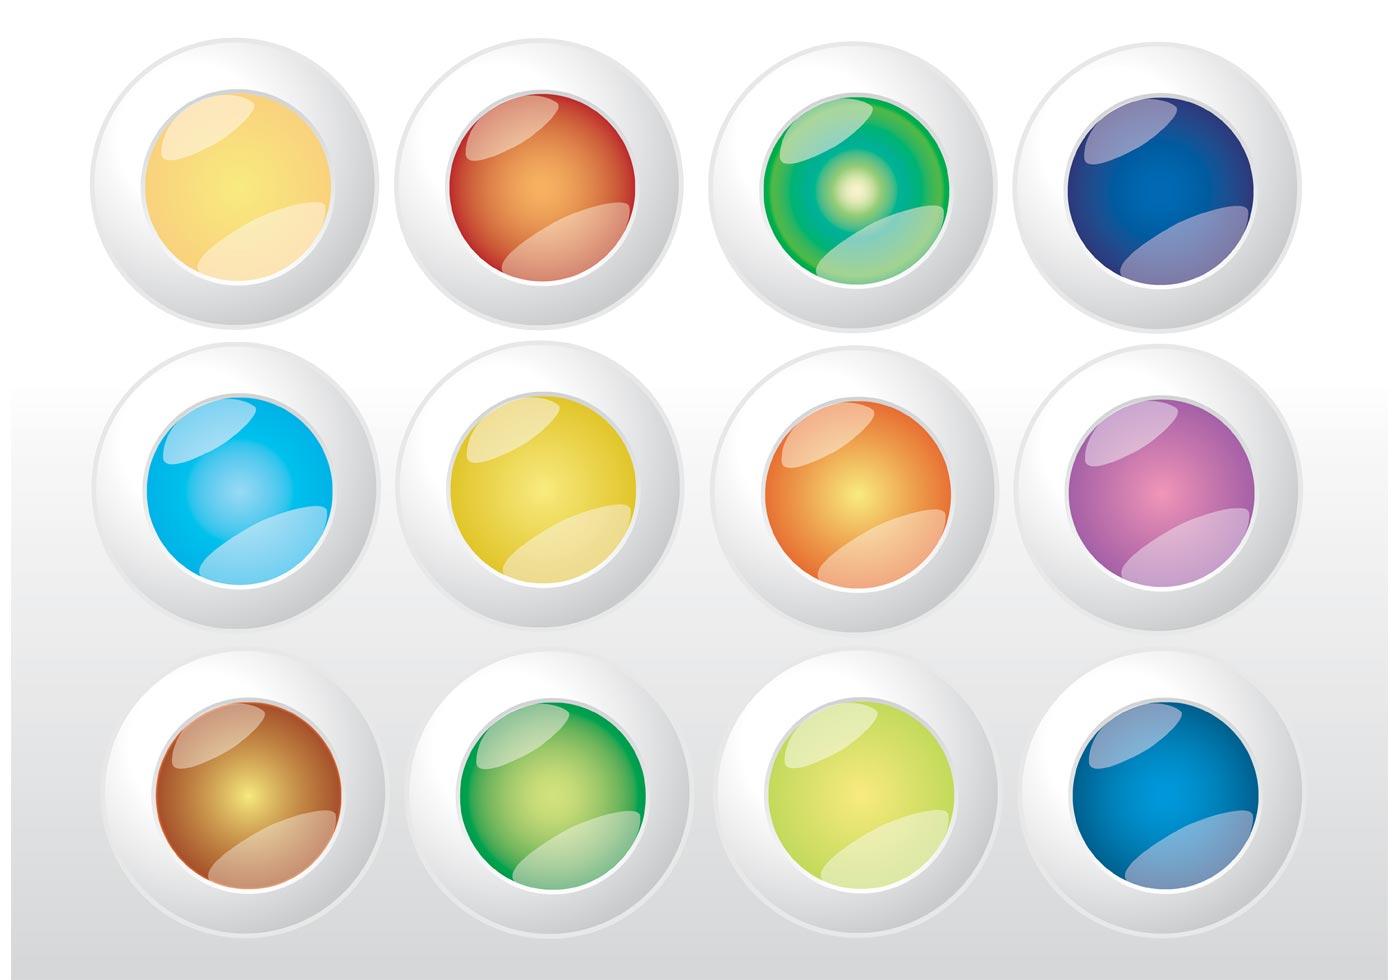 Vector Illustration Web Designs: Colorful Web Buttons Vectors